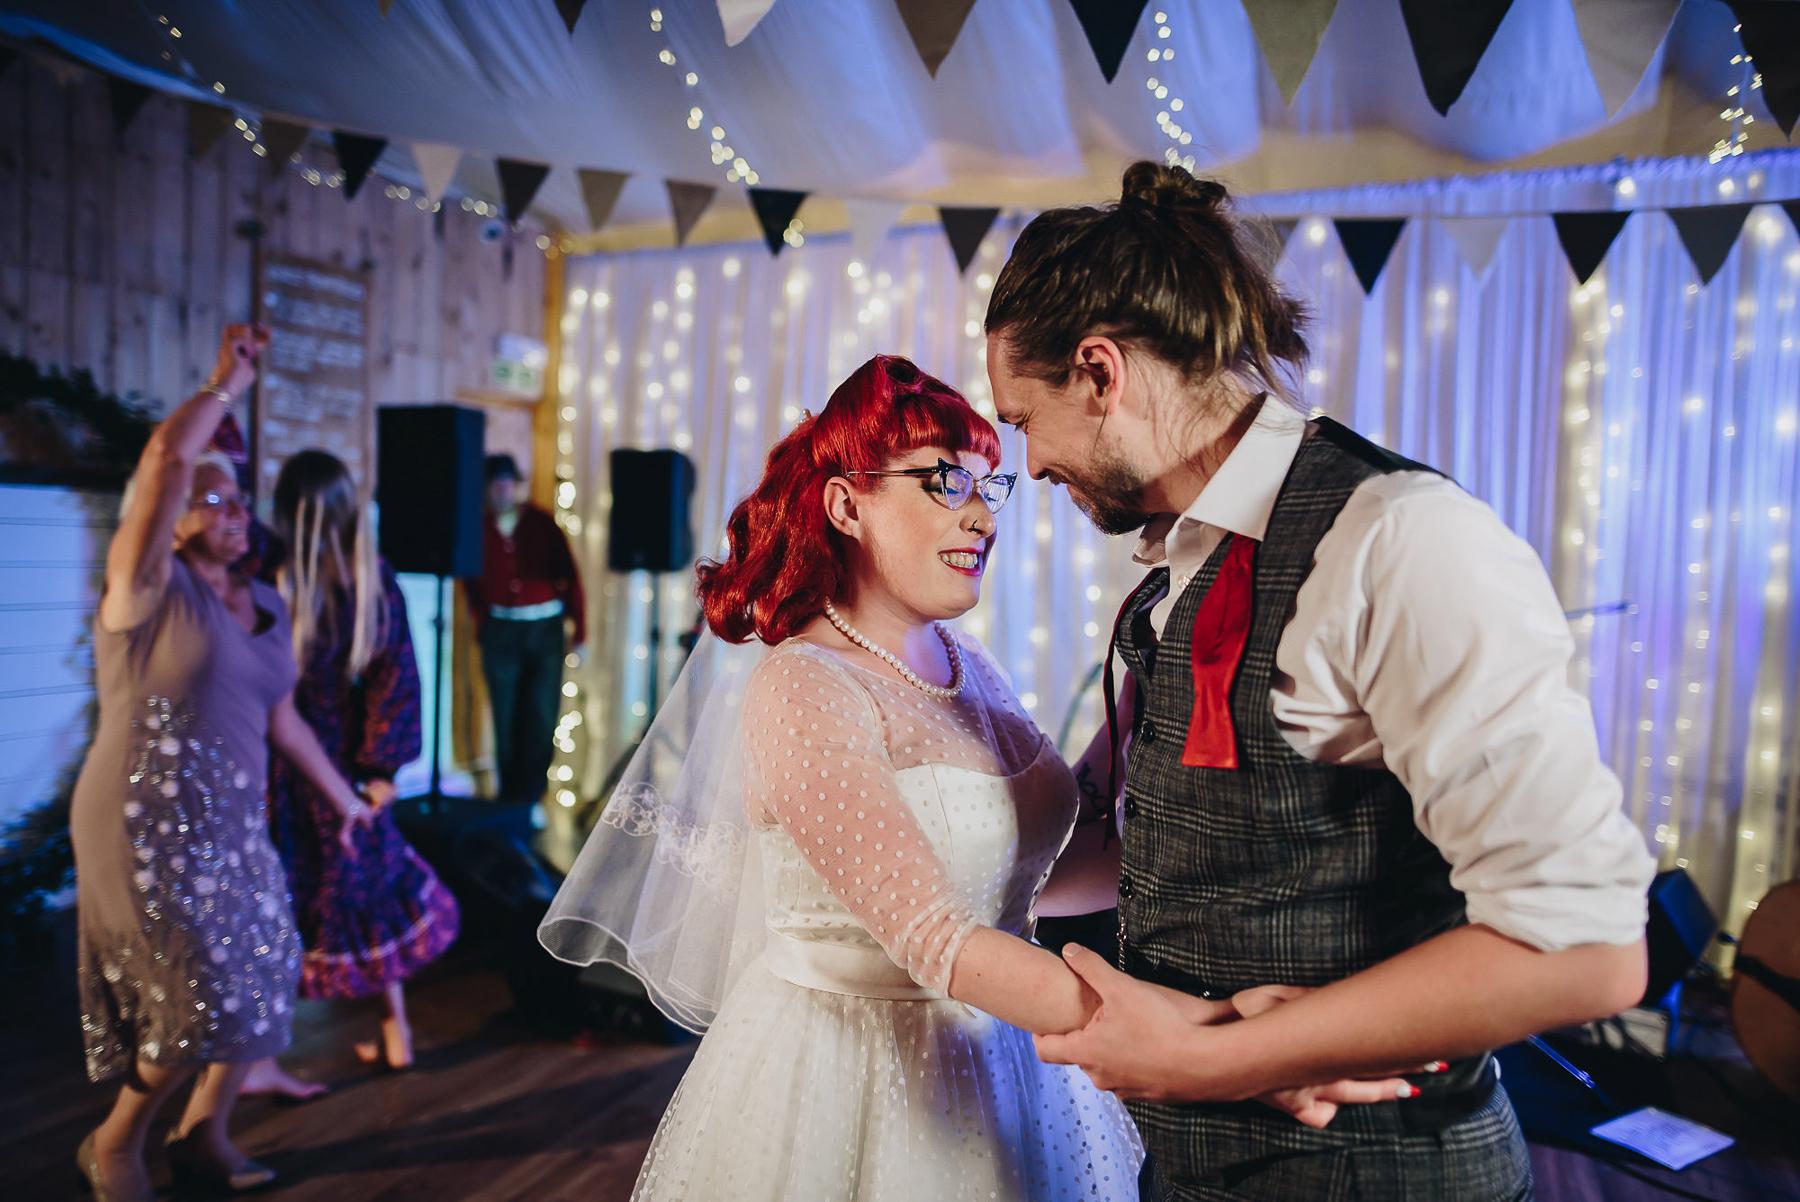 Wellbeing_Farm_Wedding_Photography_The_Pin-Up_Bride_Lara_Shaun-142.jpg